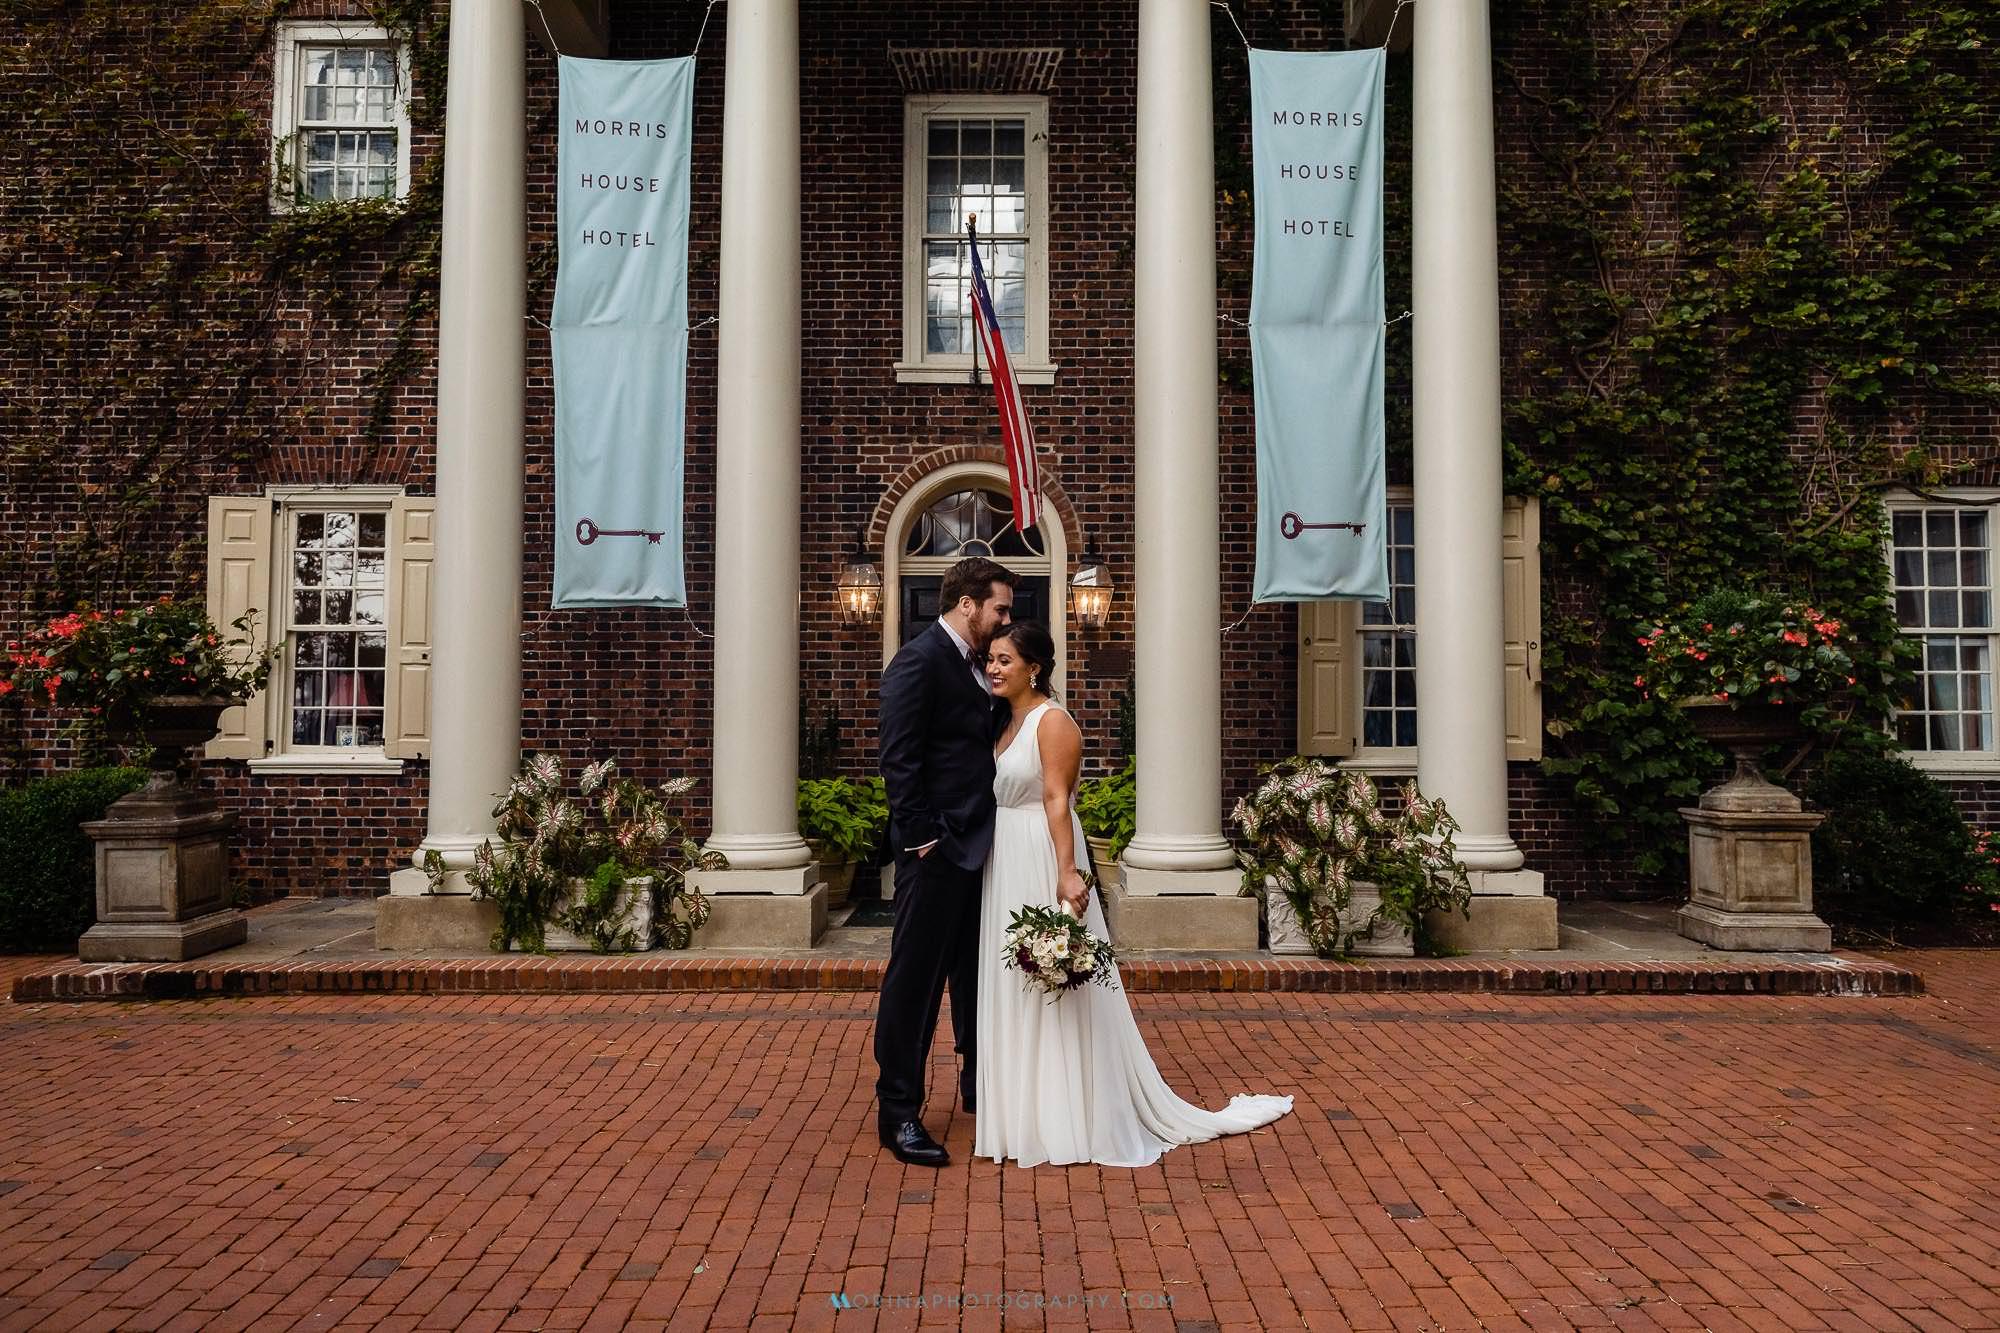 Yuki & Michael Wedding at Morris House Hotel Blog 0054.jpg